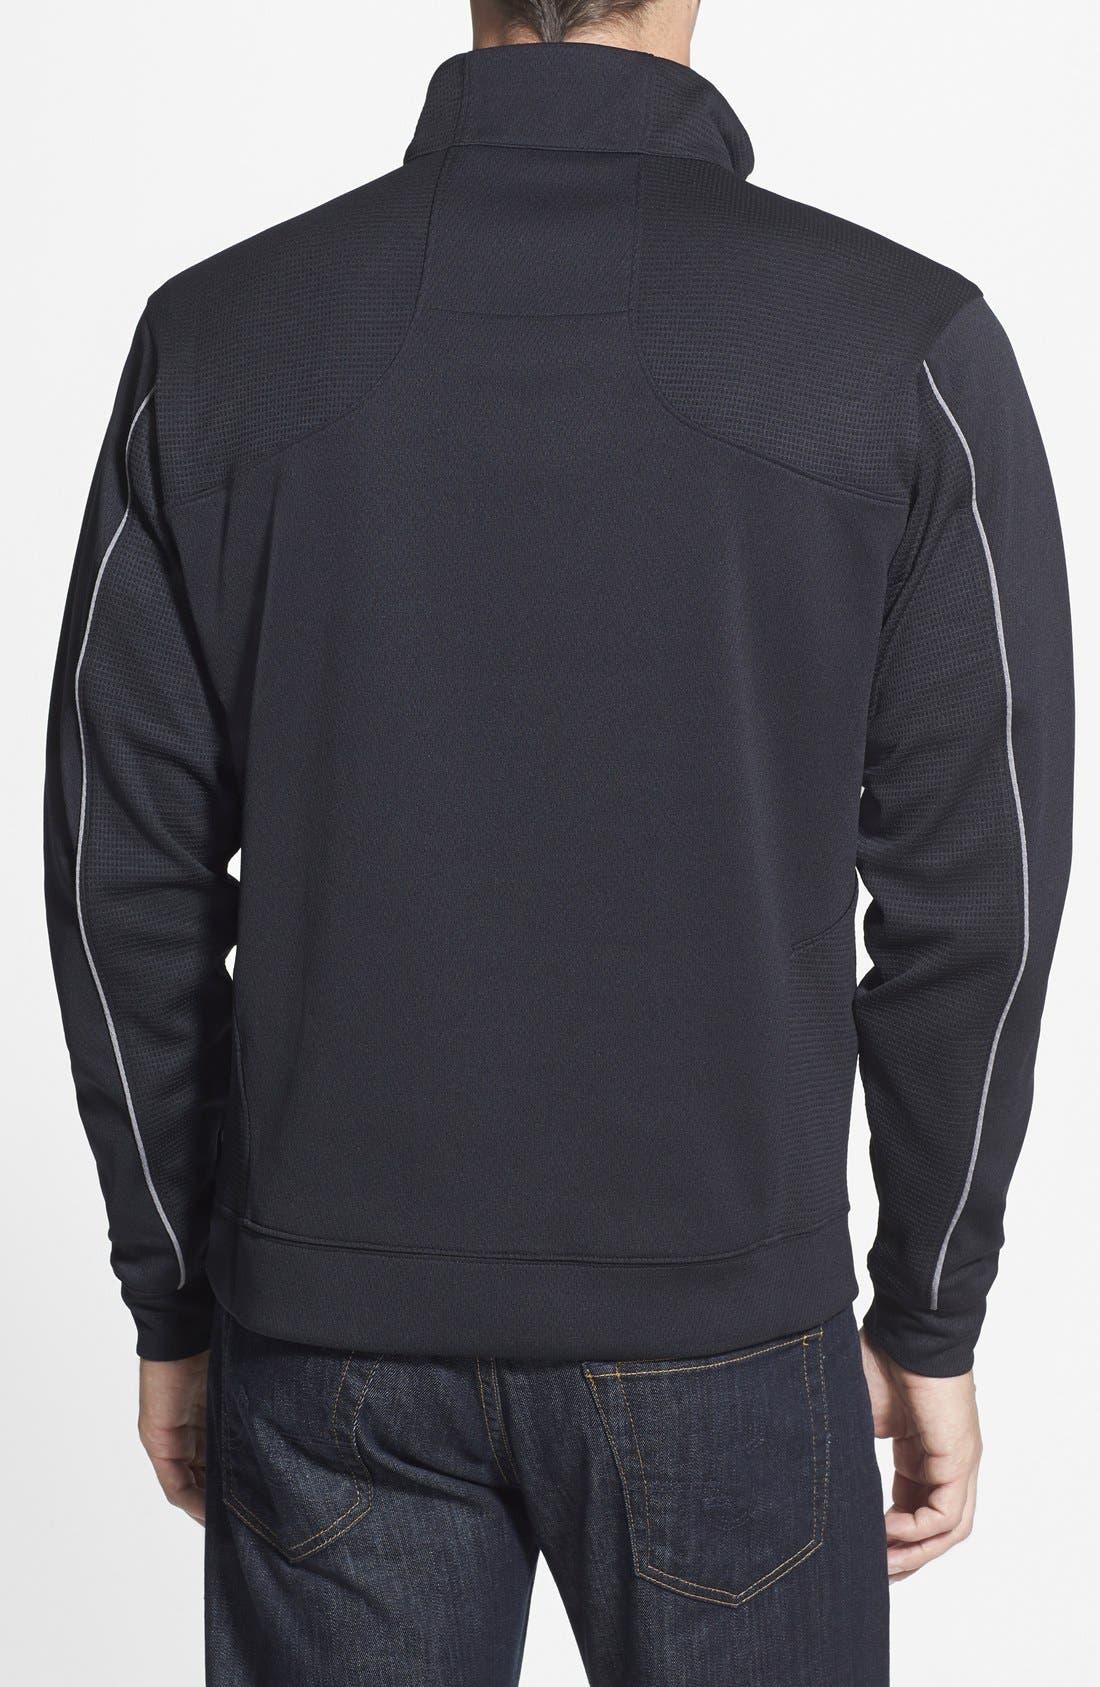 Arizona Cardinals - Edge DryTec Moisture Wicking Half Zip Pullover,                             Alternate thumbnail 2, color,                             Black